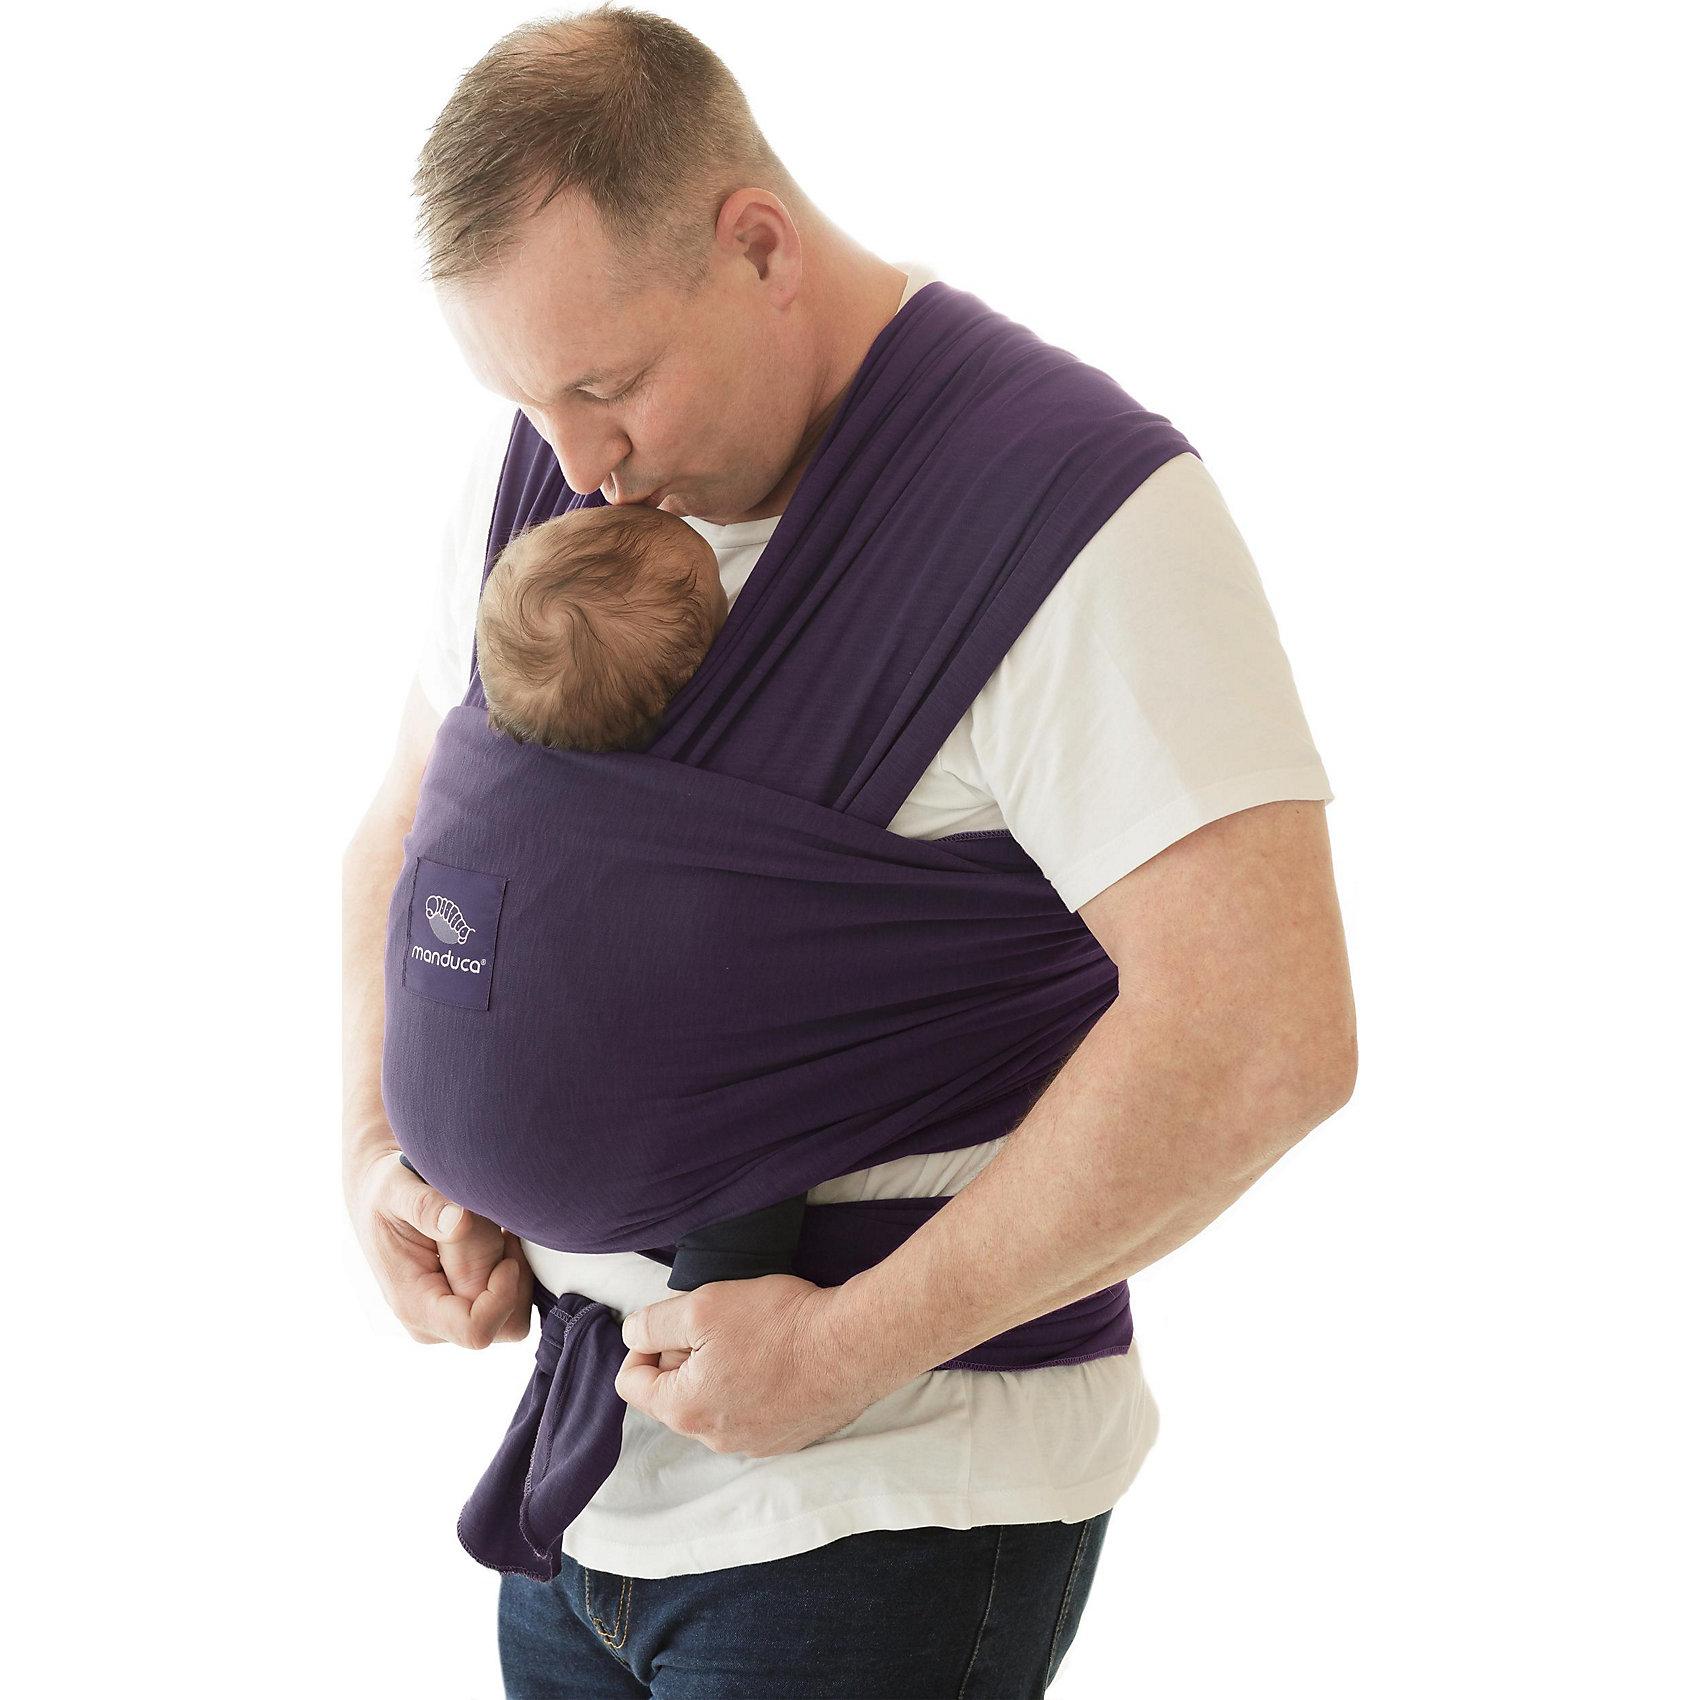 Neu-manduca-Tragetuch-sling-black-6068626